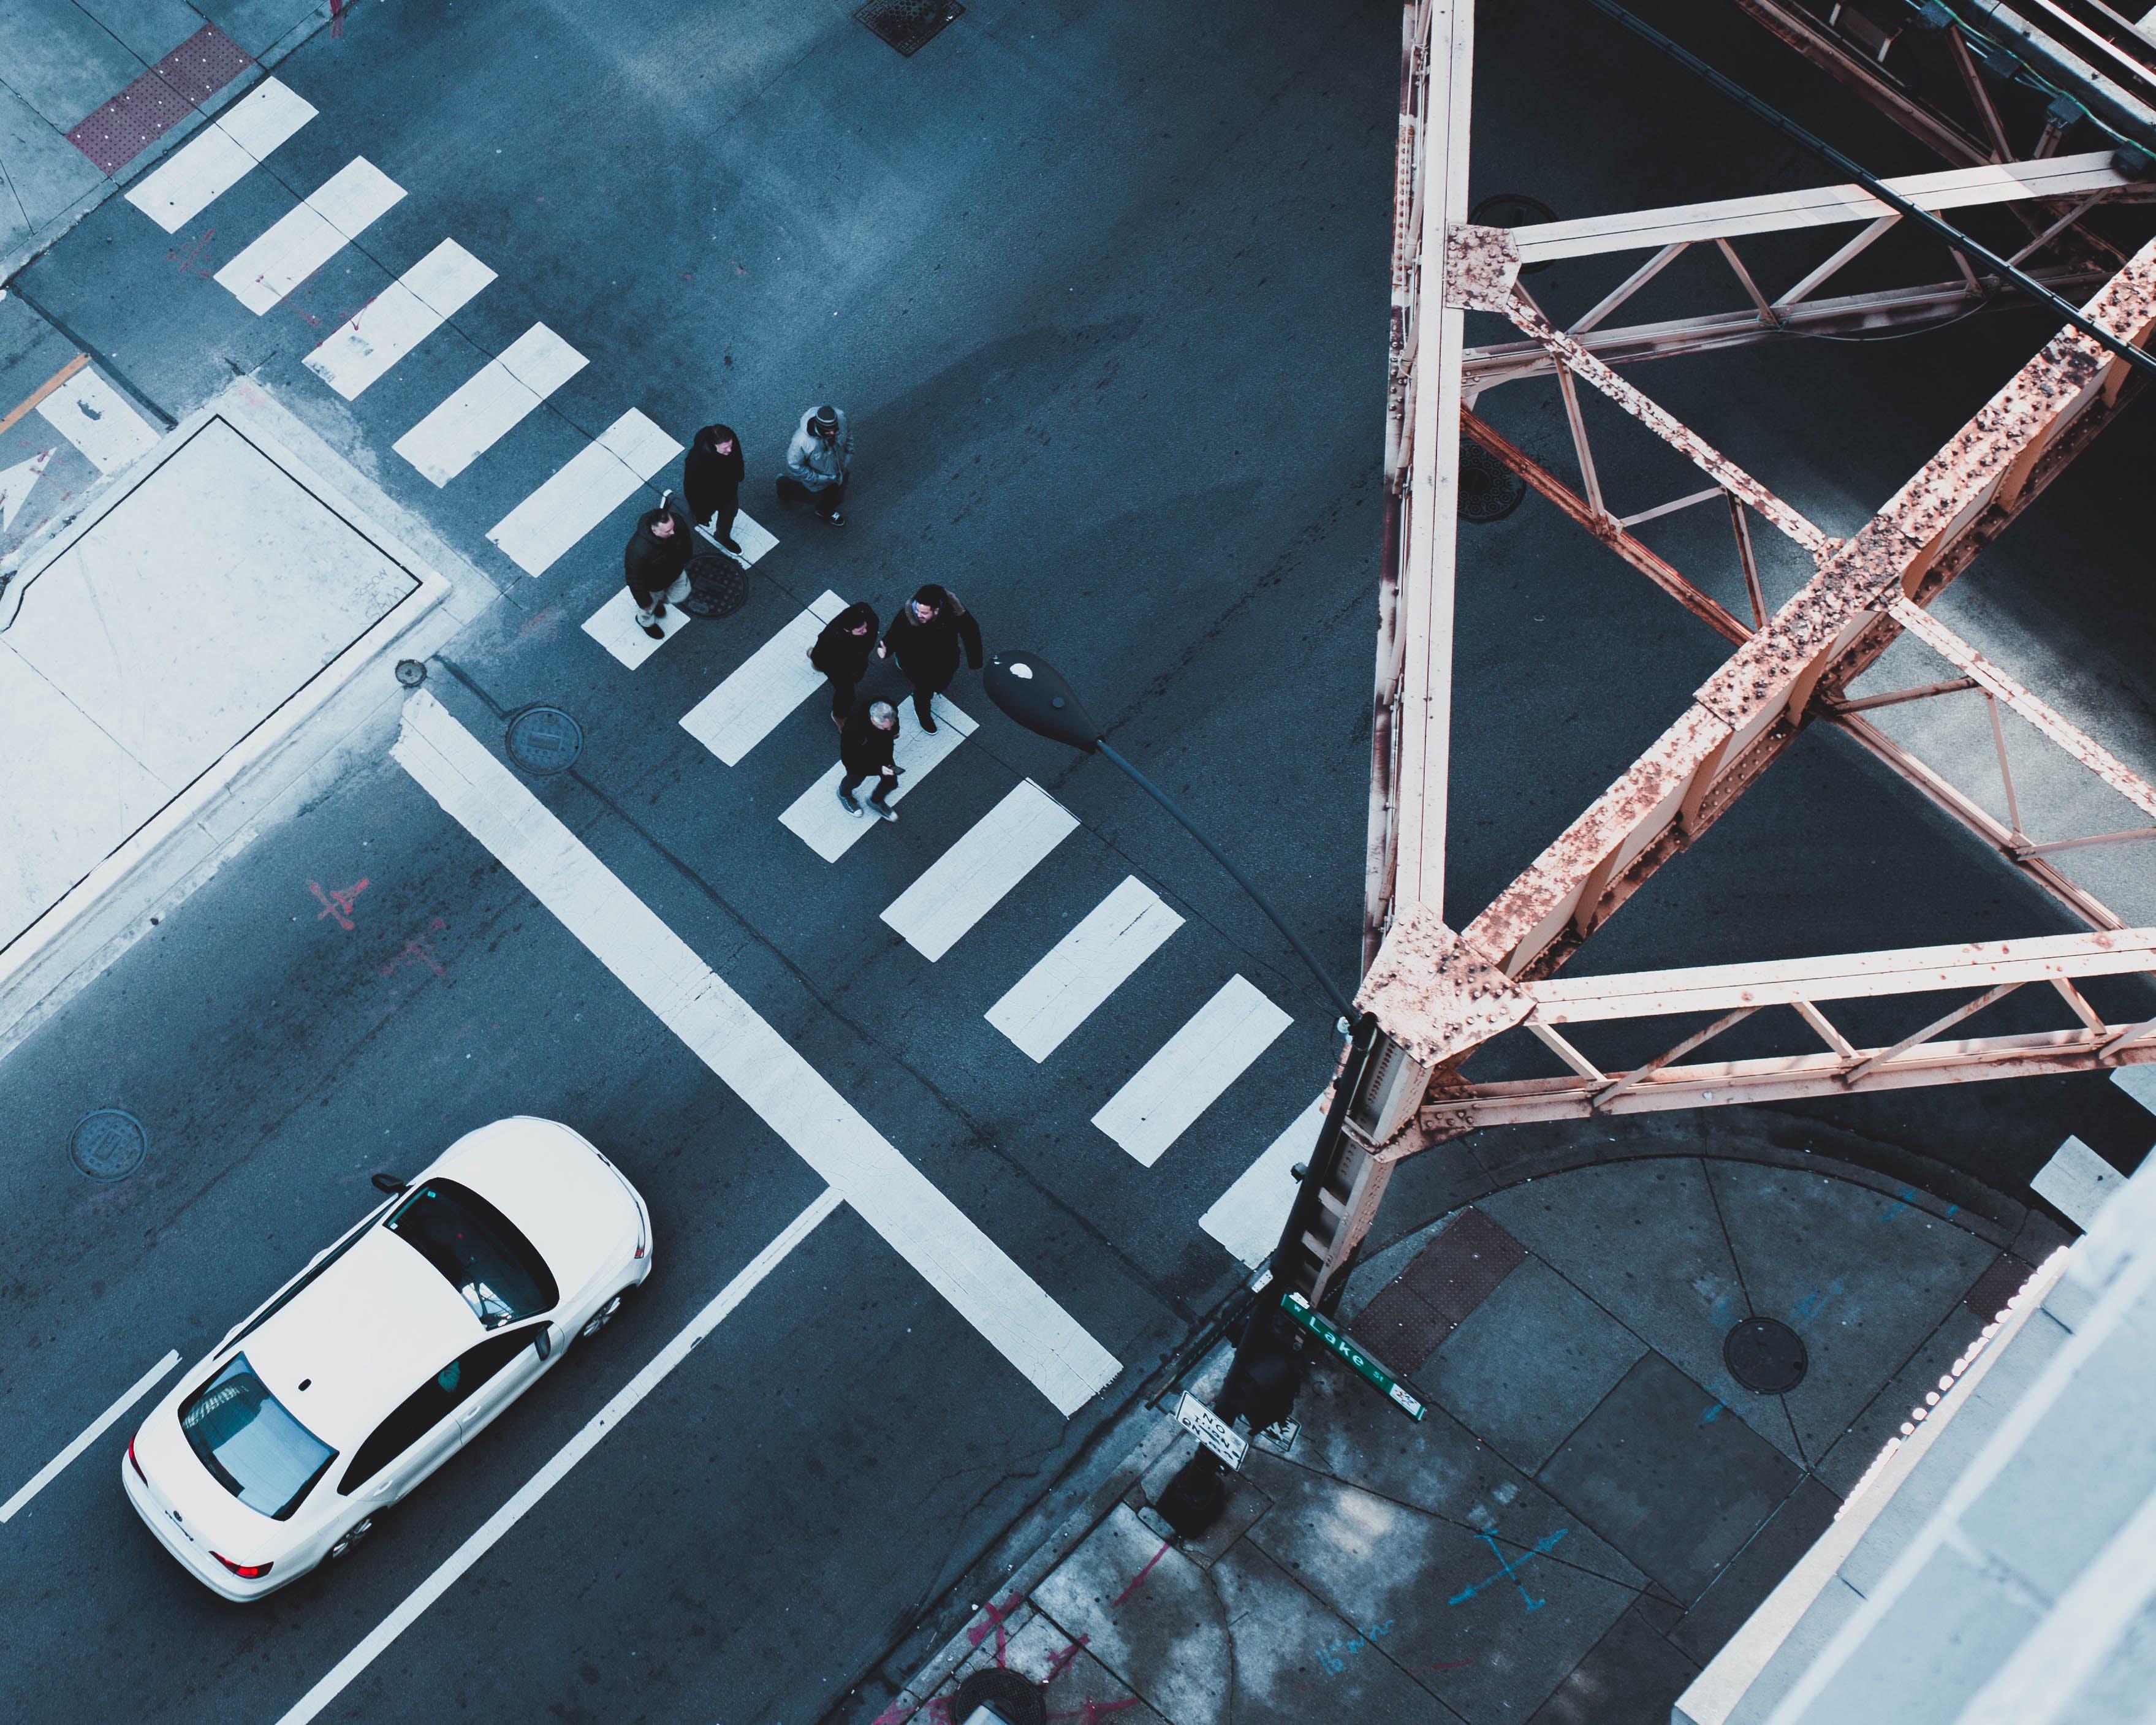 Kostenloses Stock Foto zu auto, fahrbahn, fahrzeug, fußgänger